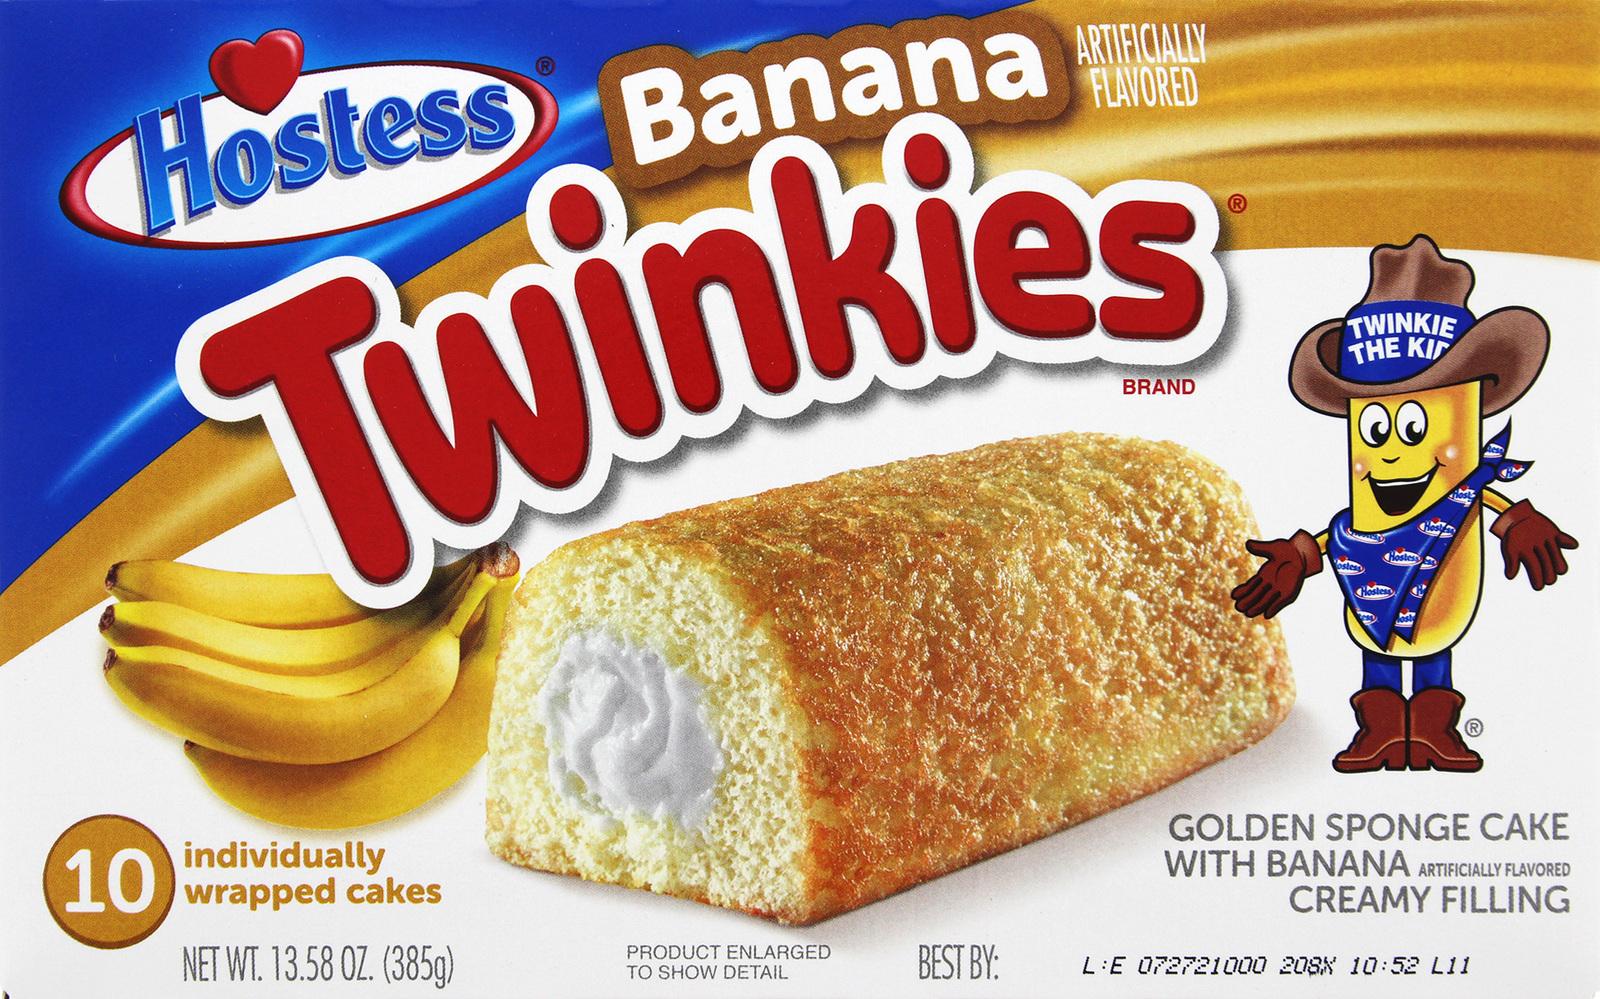 Hostess Twinkies Banana (10 Pack) image